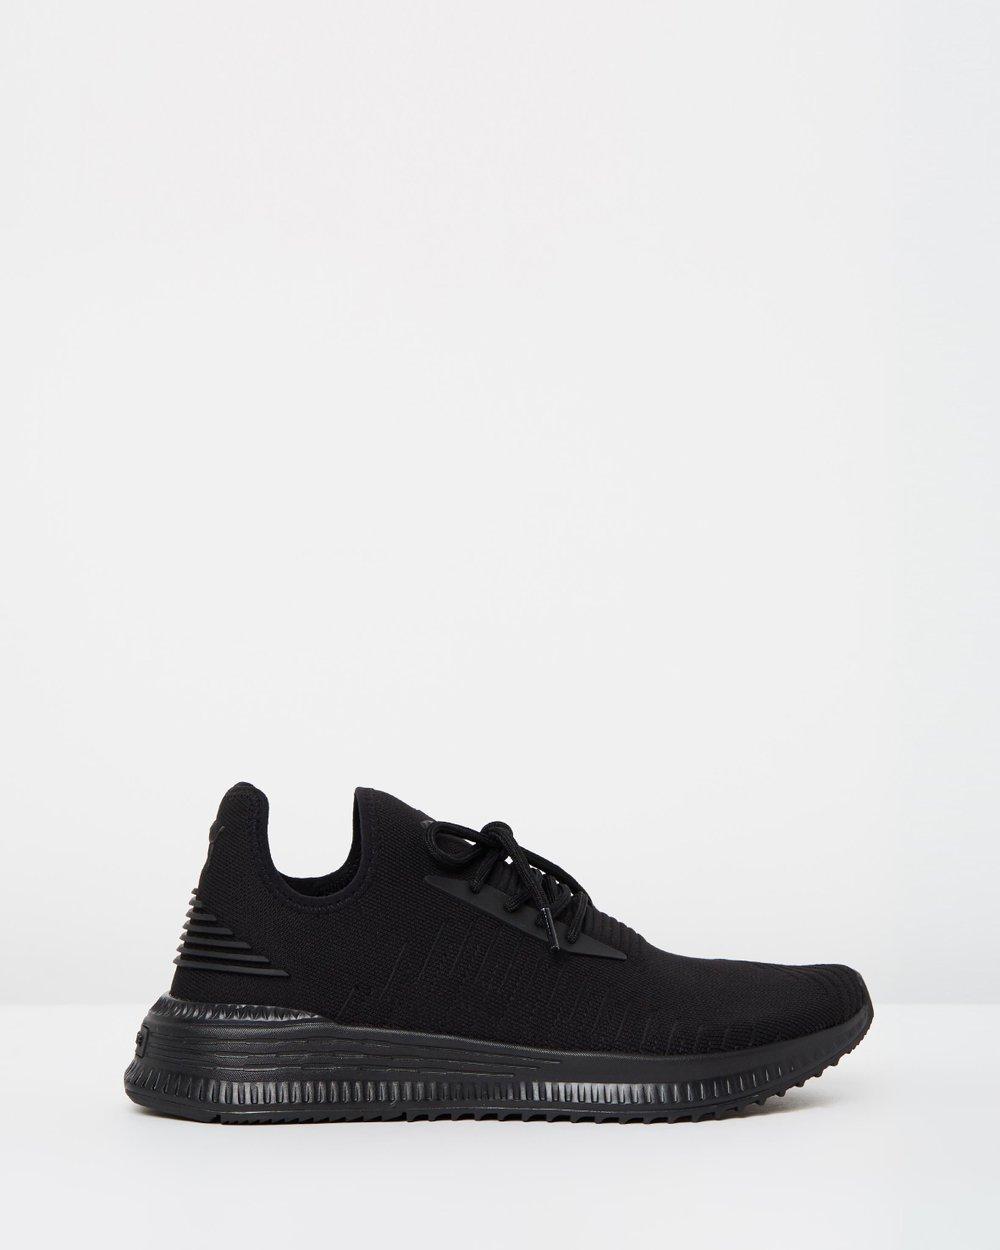 a9f63704679 Tsugi Mi Avid Evoknit Sneakers - Men s by Puma Online